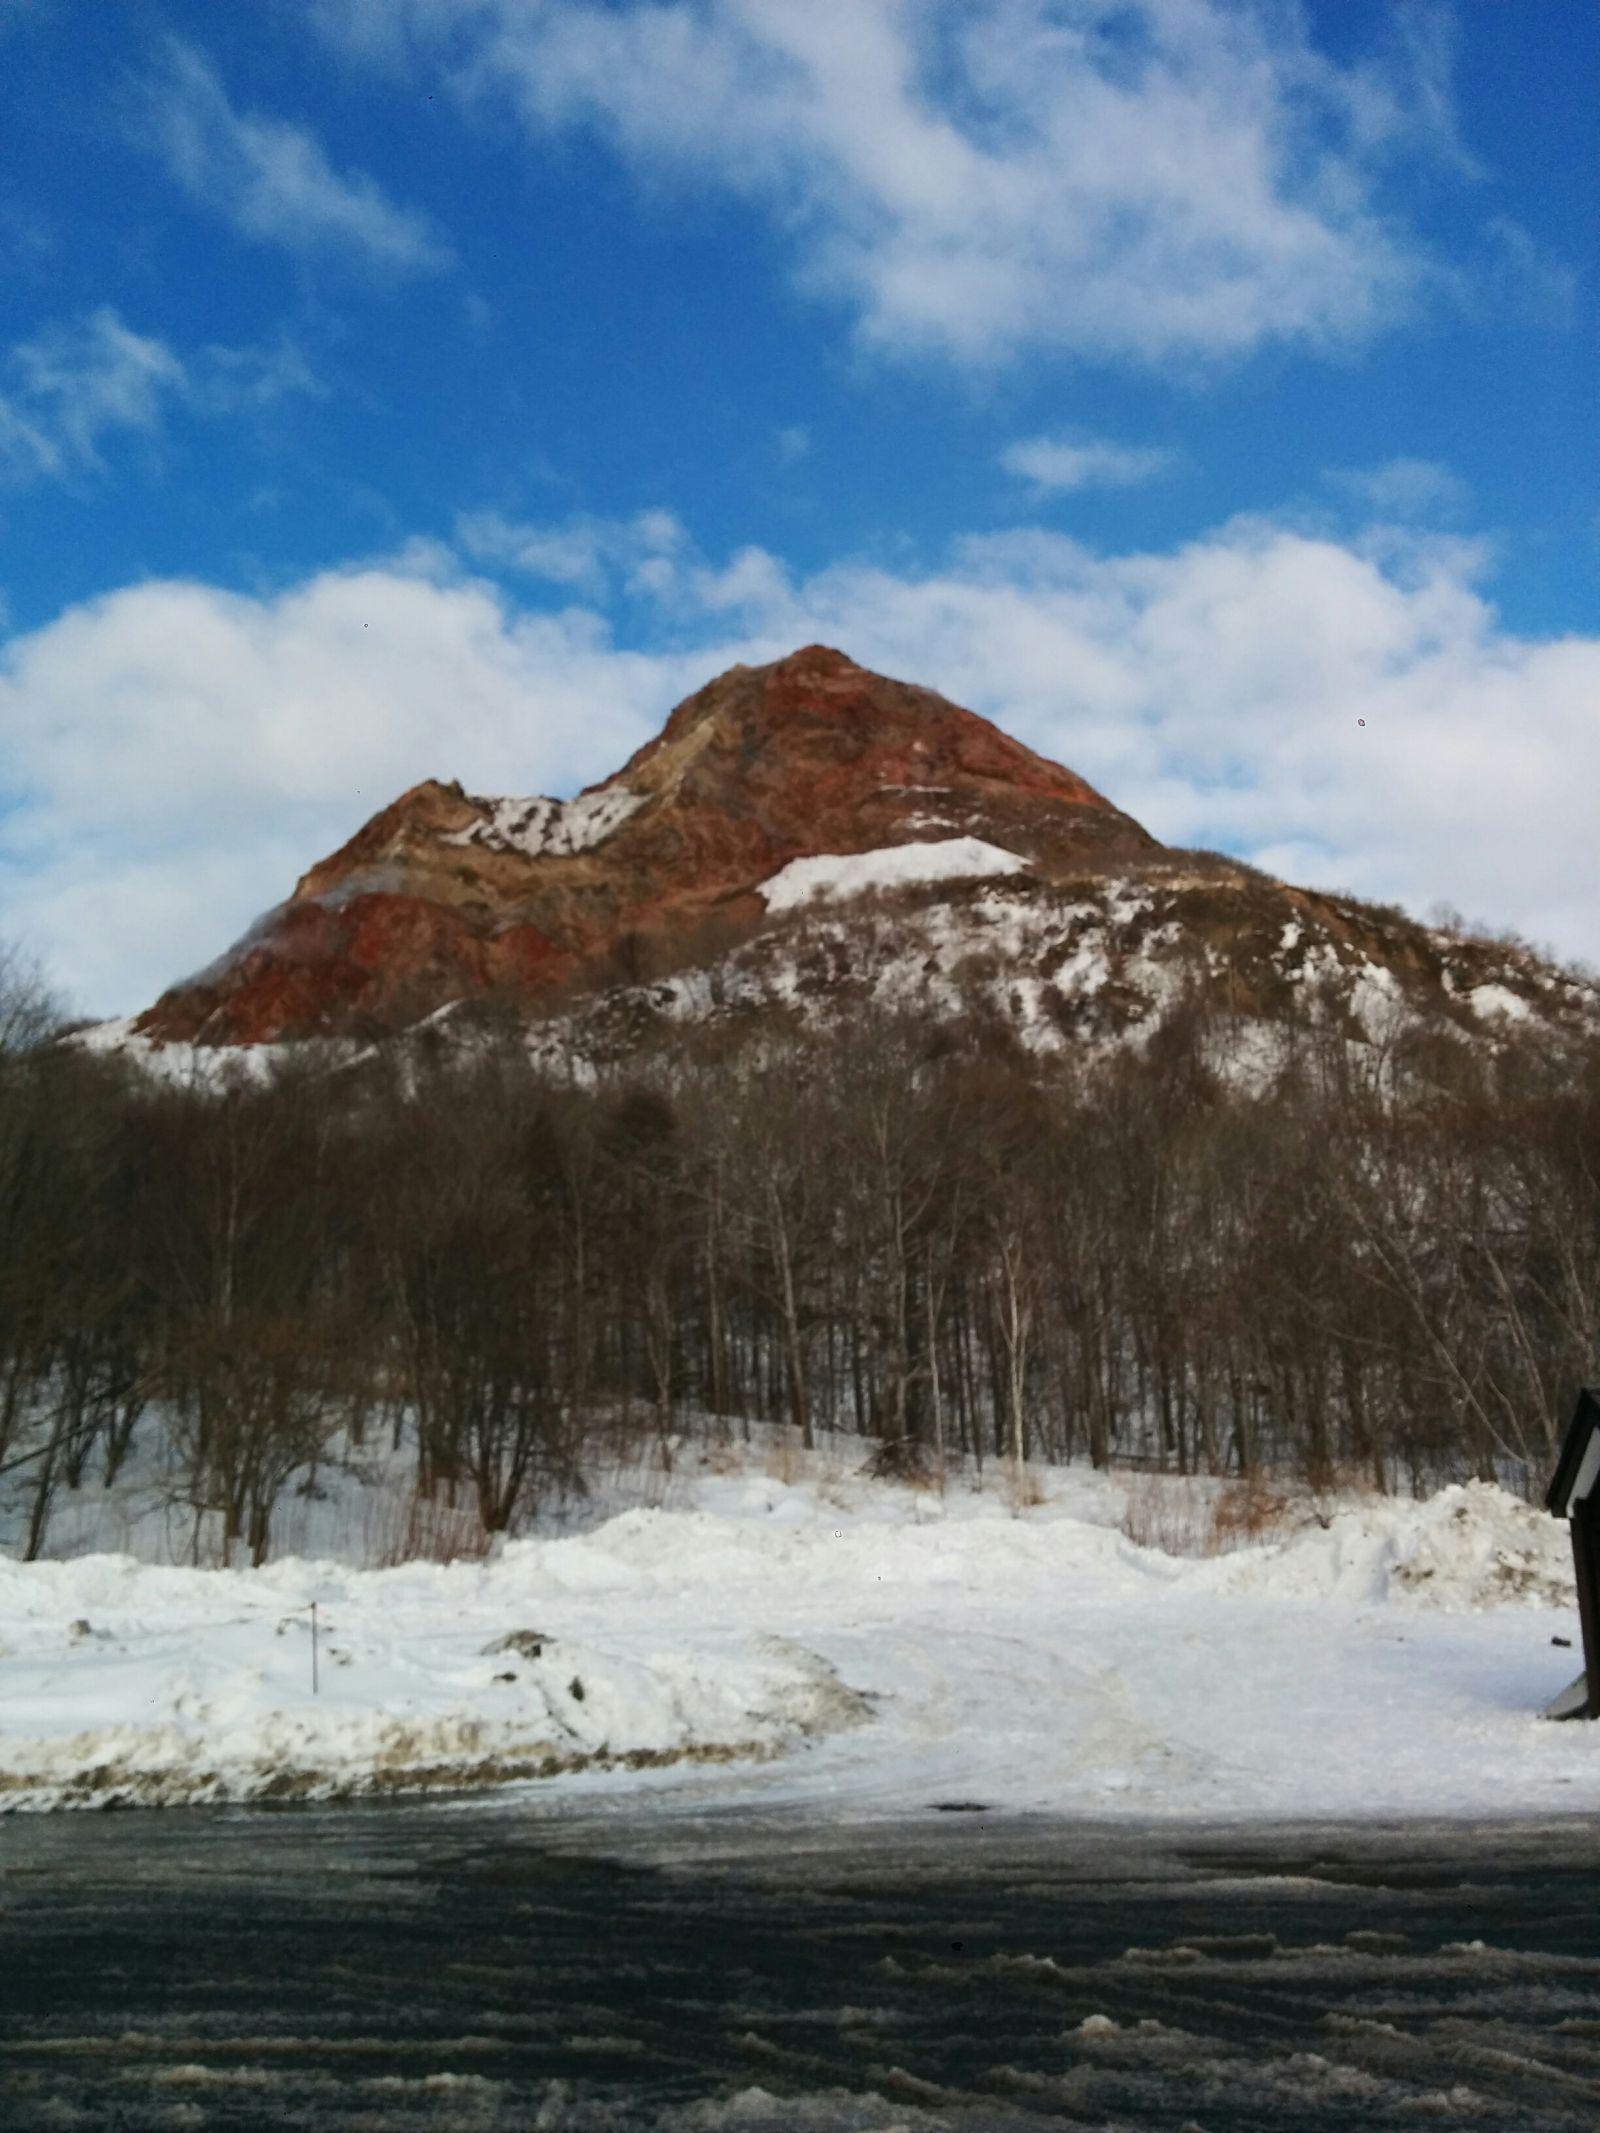 【洞爺湖周辺】洞爺湖周辺昭和新山・有珠山観光タクシー